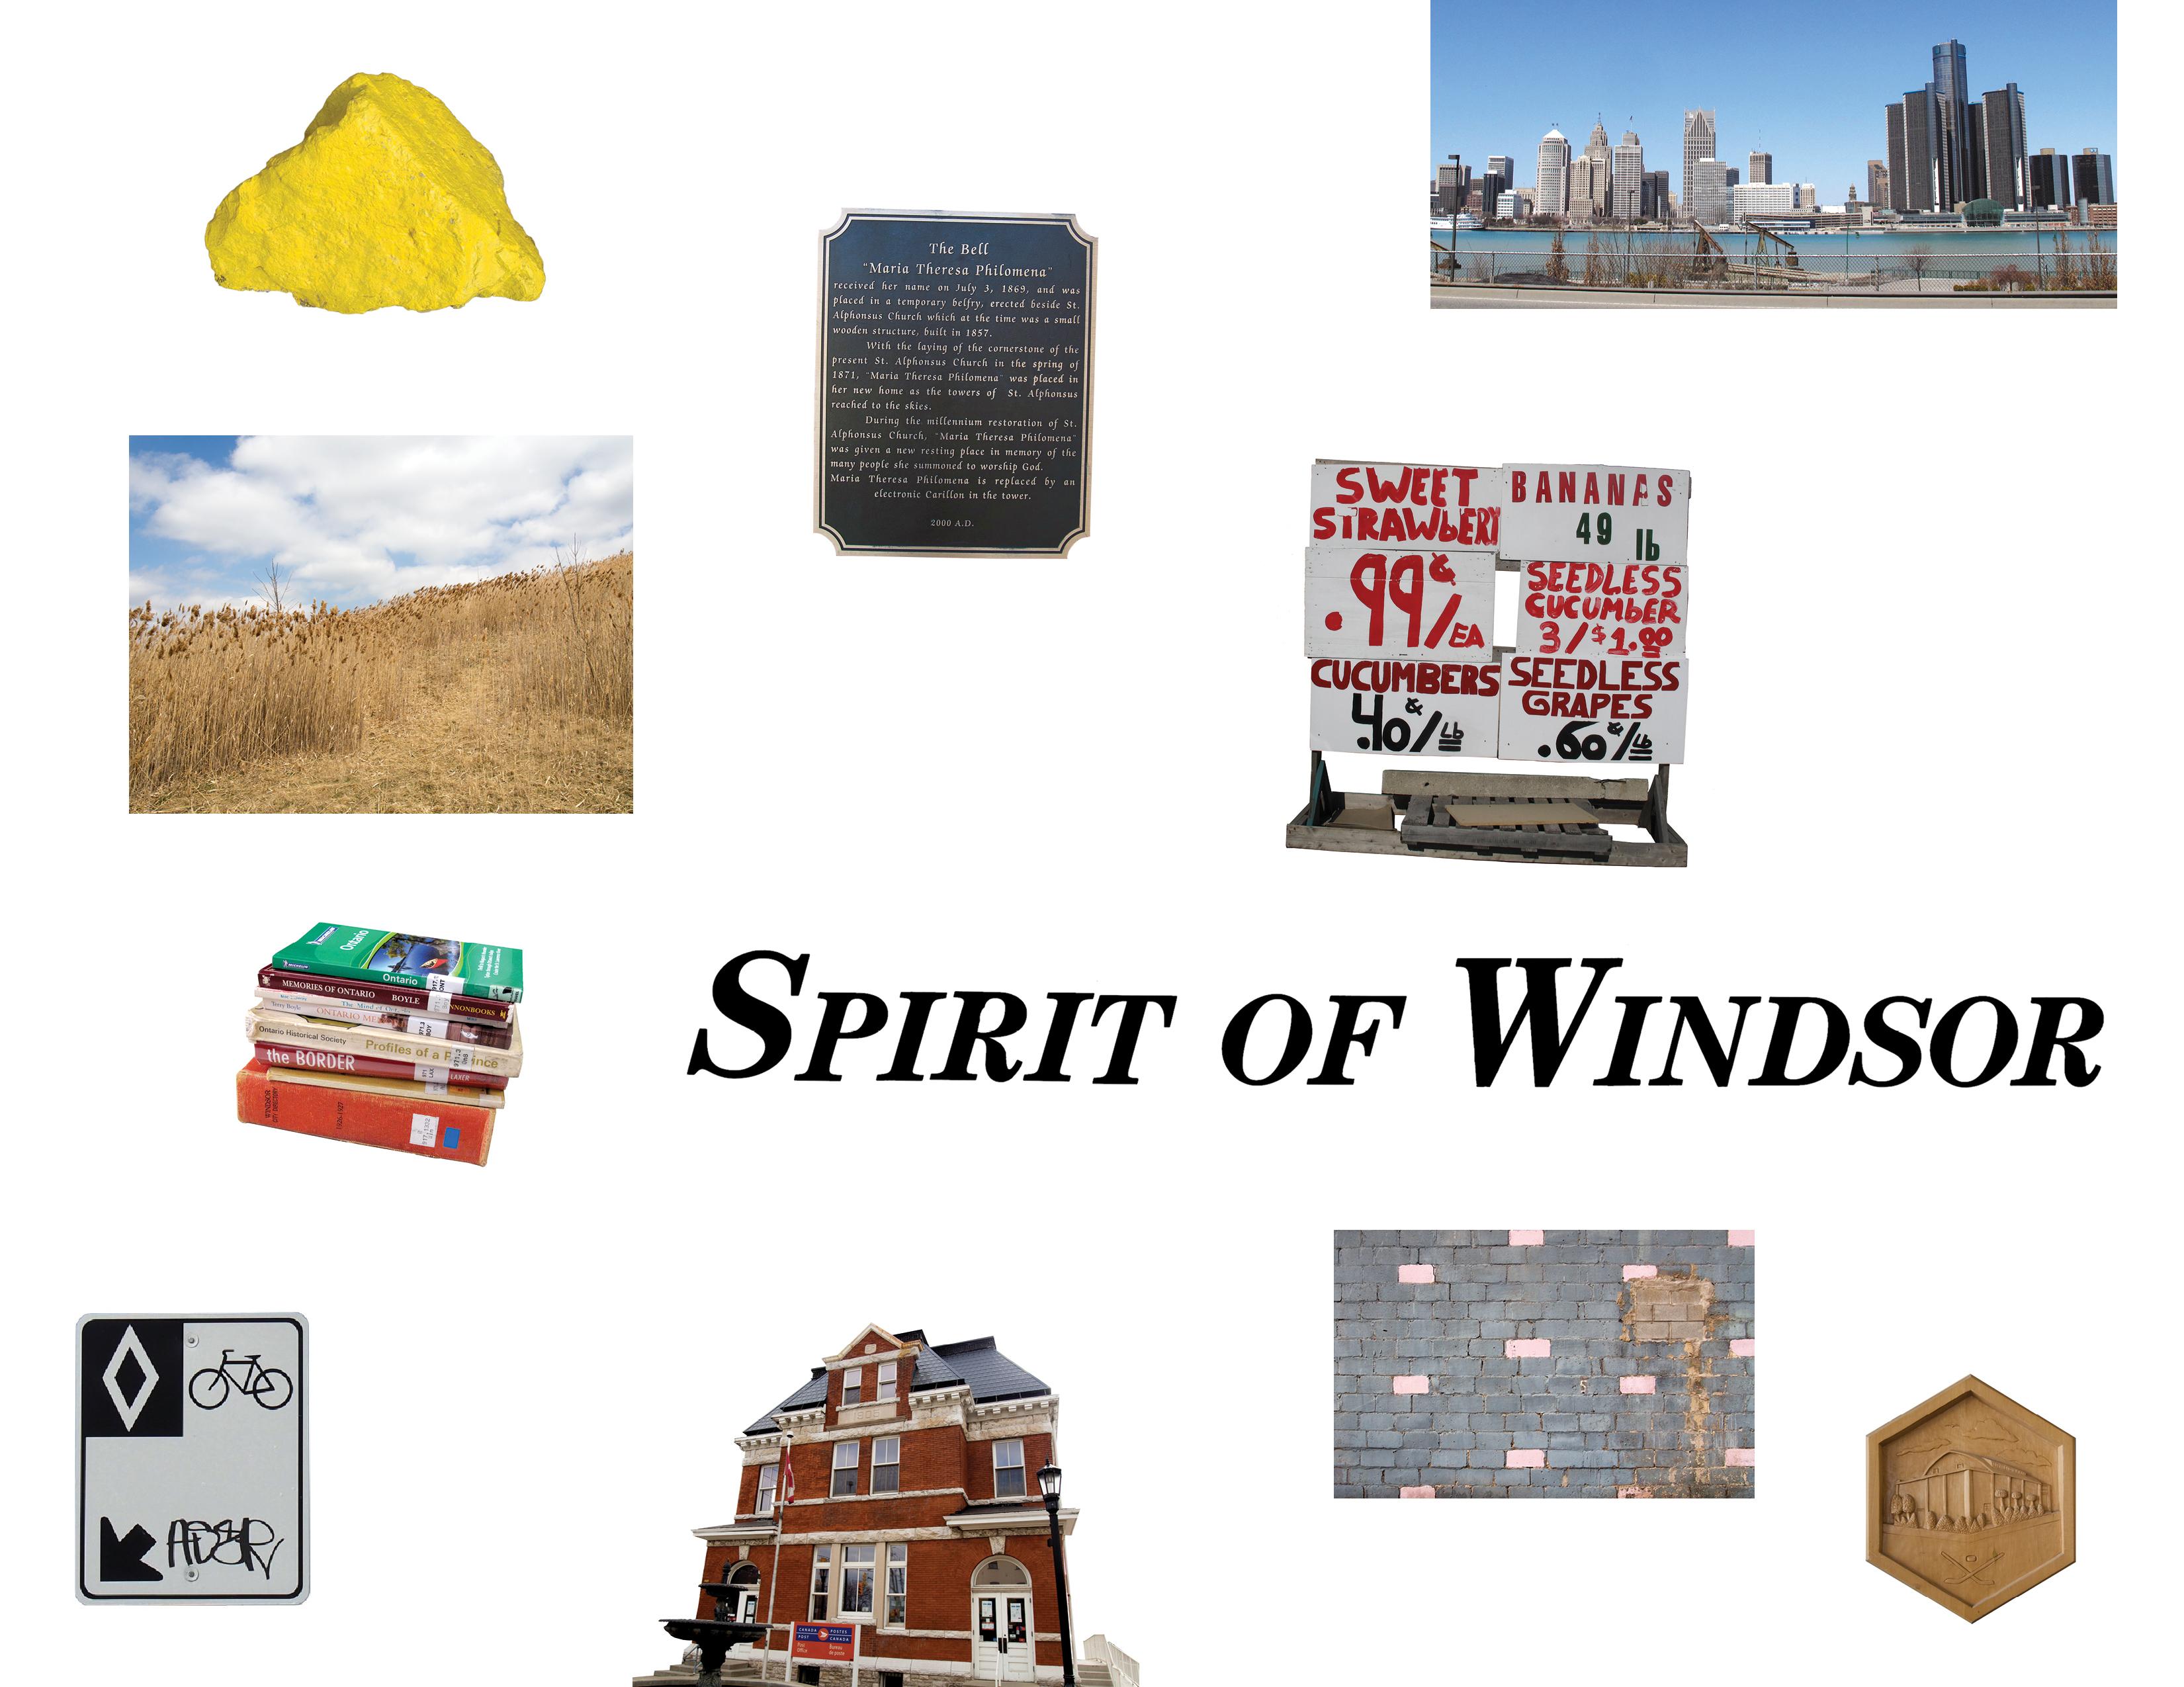 SpiritofWindsorWeb